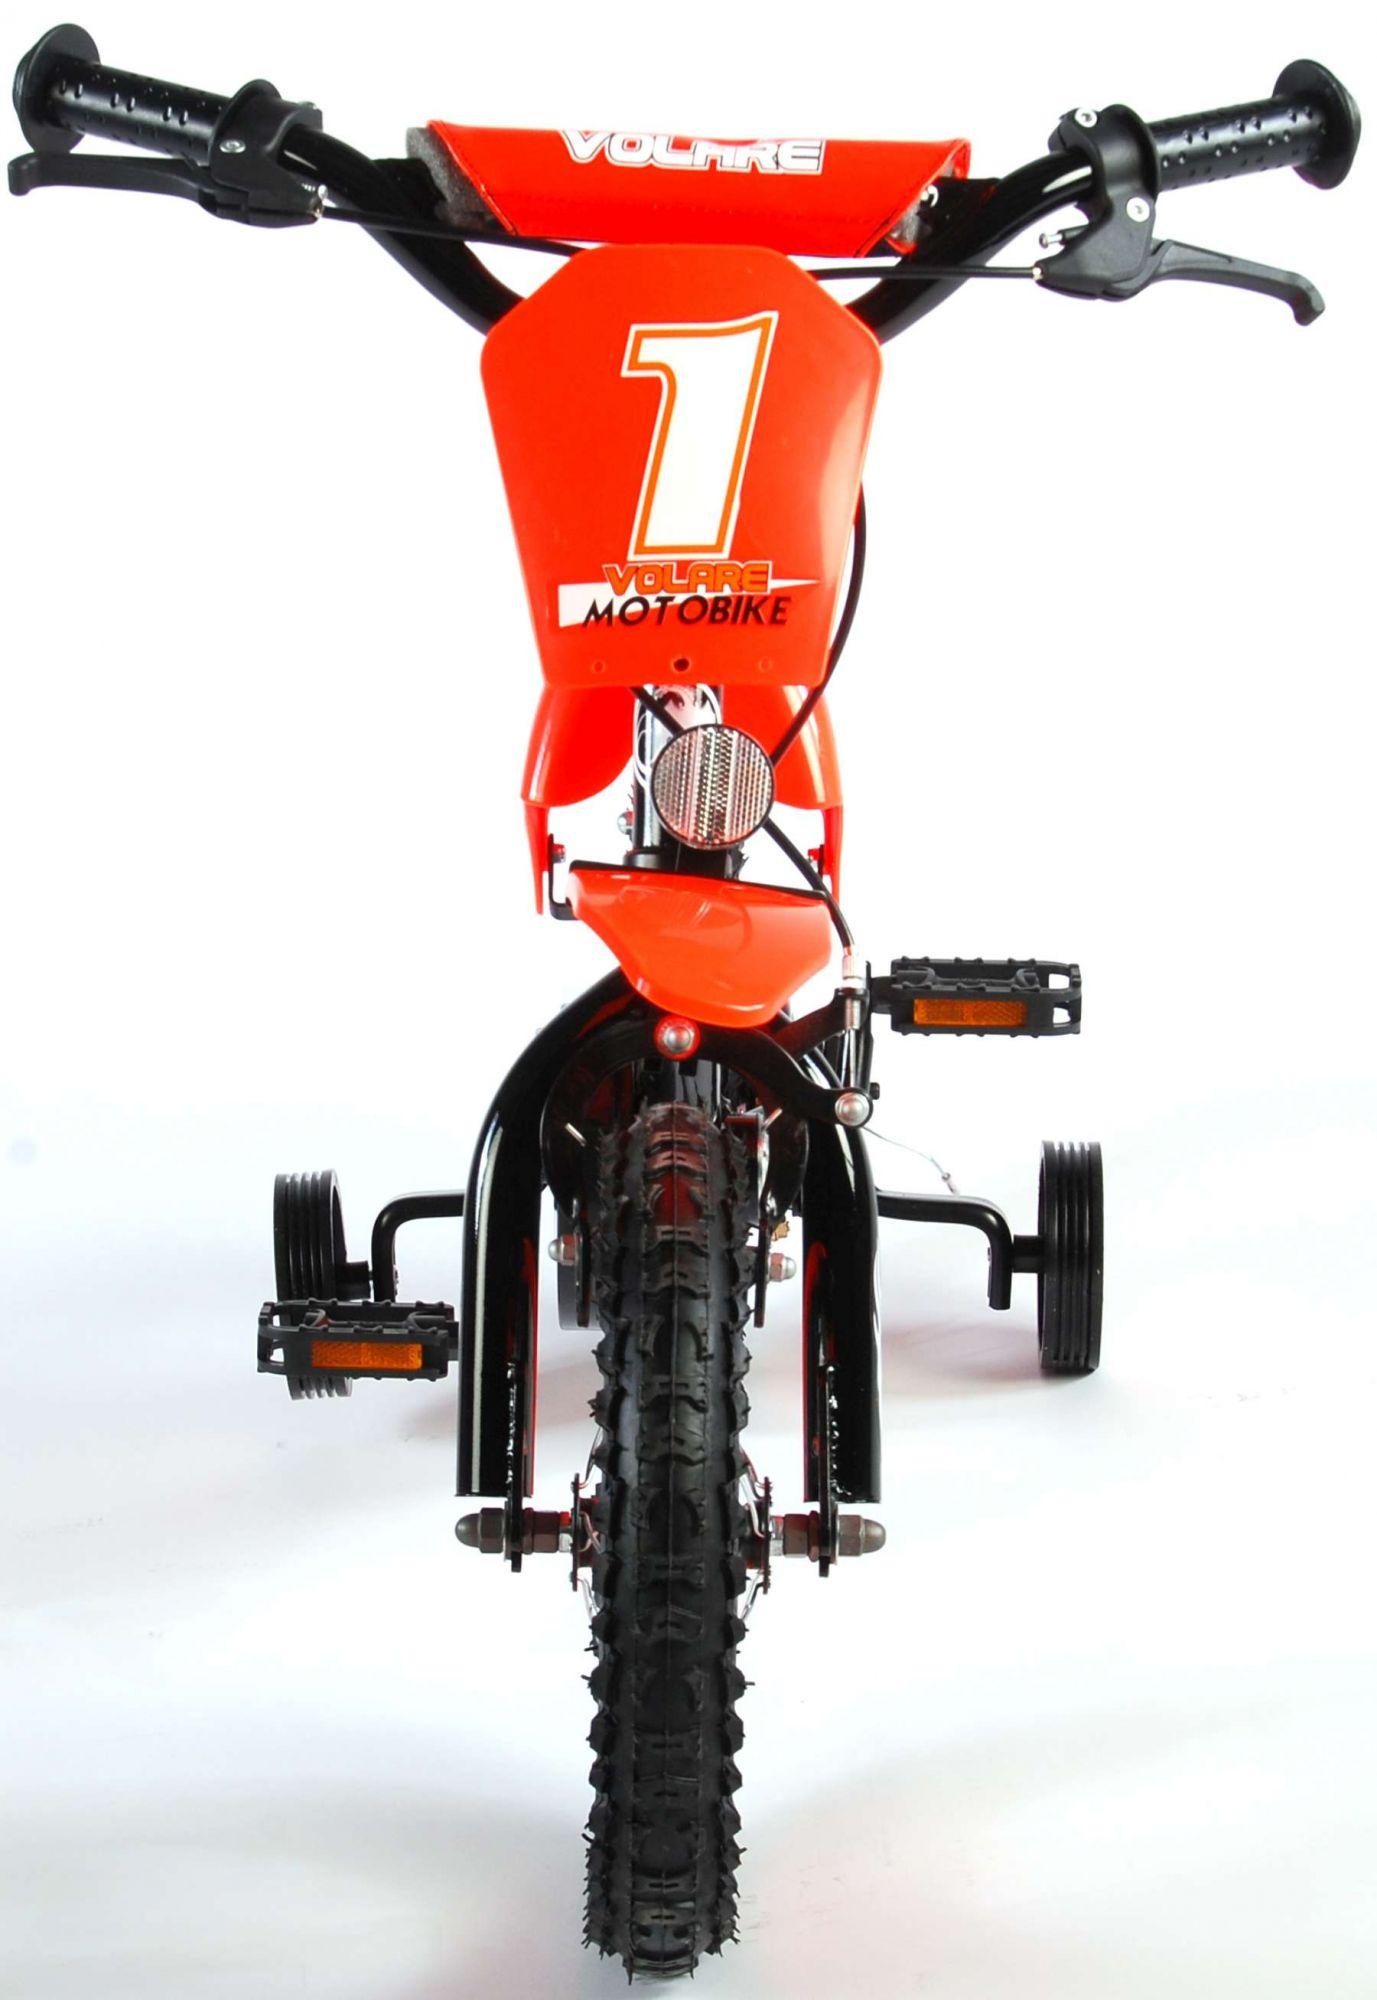 Bicicleta Motorbike de 12 pulgadas Naranja - vista frontal